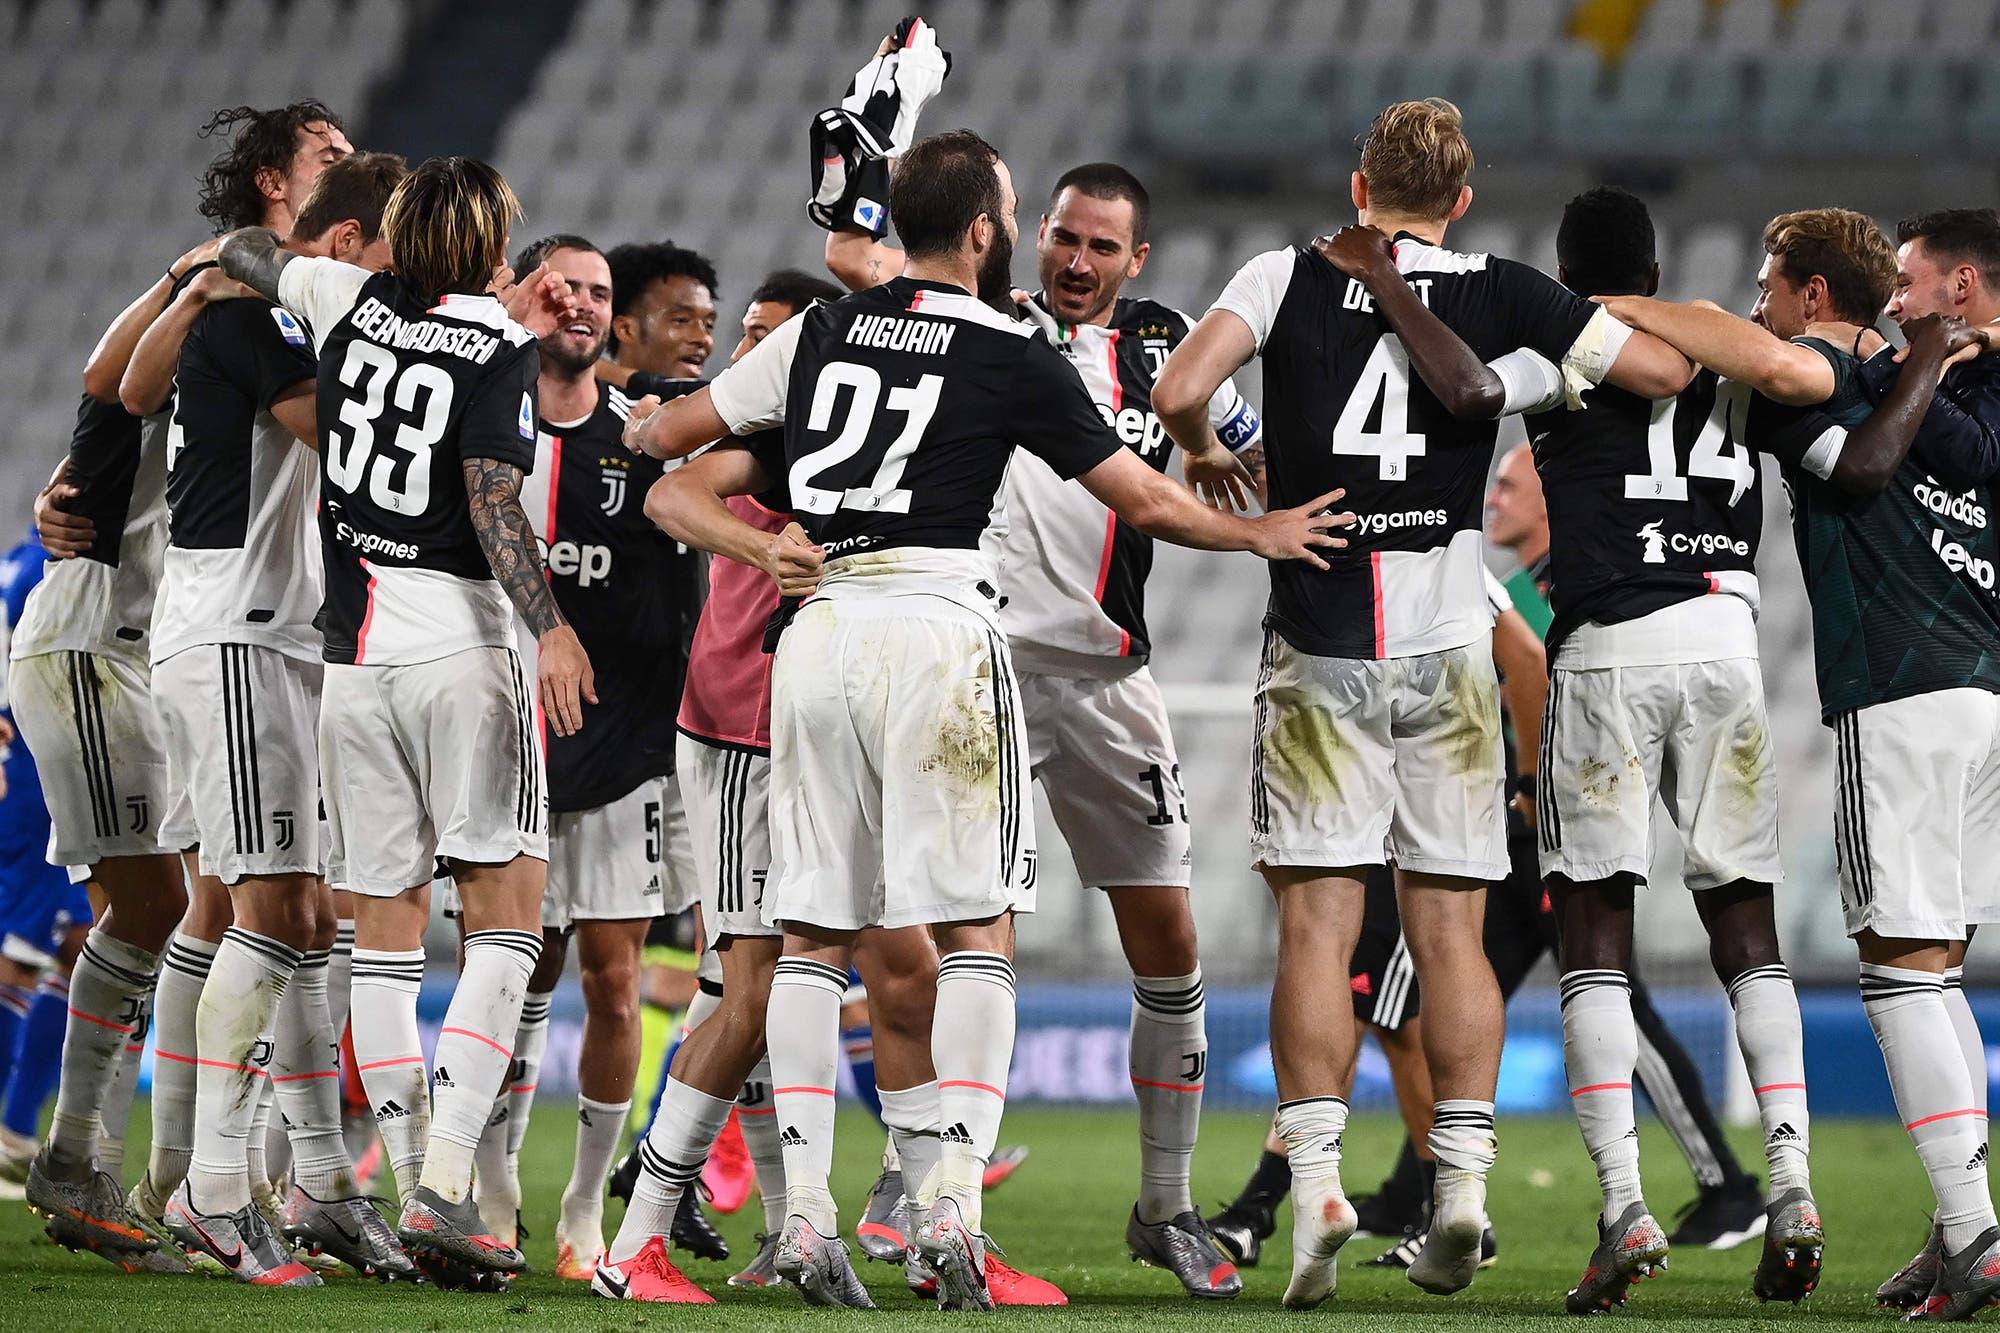 Juventus, dueño de un récord único en Europa, con un Dybala que potenció al máximo sus números